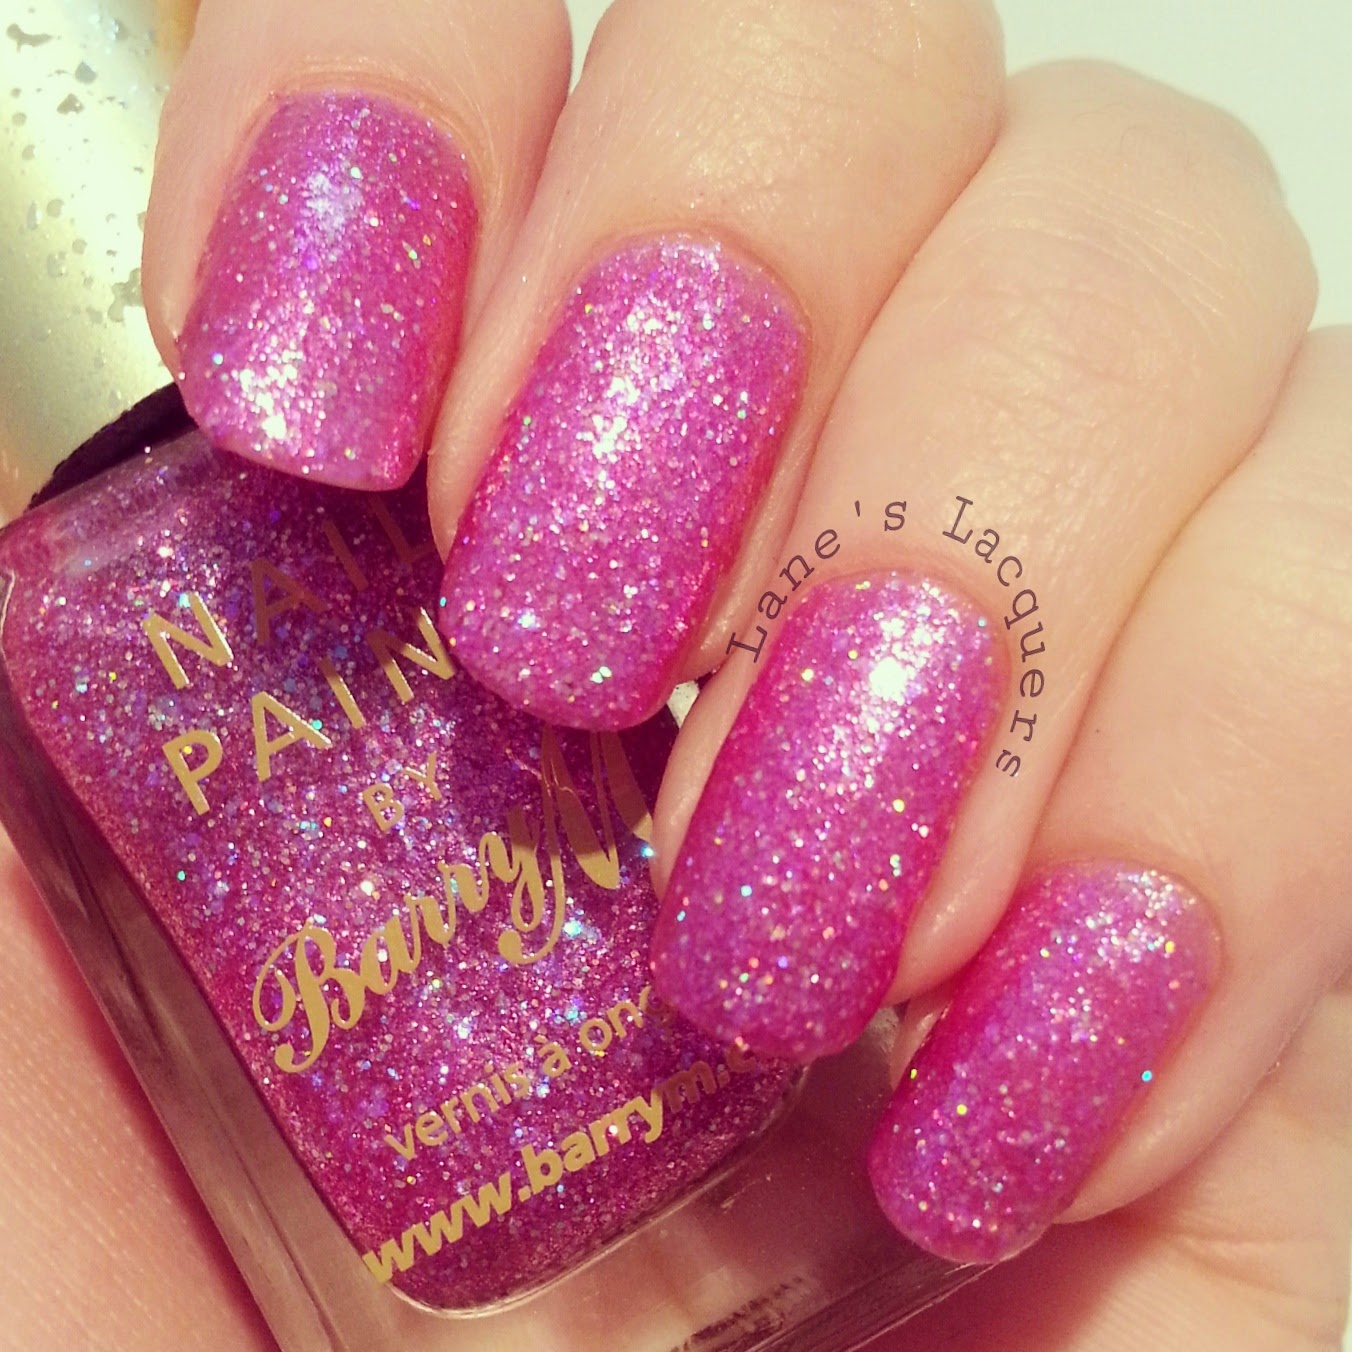 new-barry-m-glitterati-socialite-swatch-manicure (2)